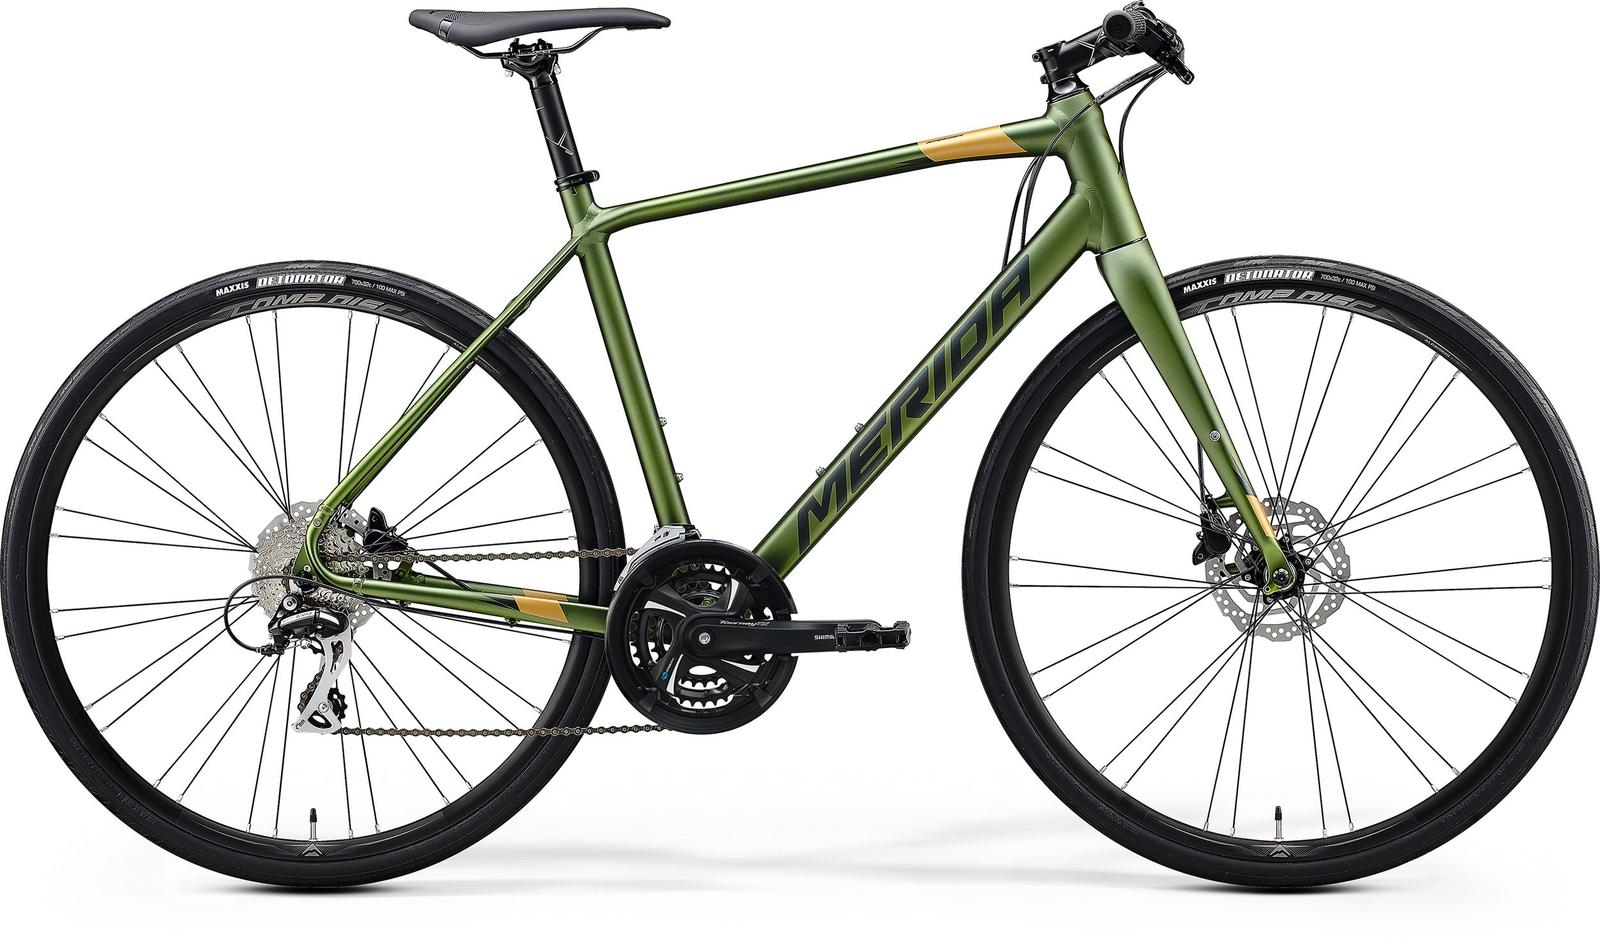 Bicicleta de sosea barbati Merida Speeder 100 Verde/Verde 2020 imagine